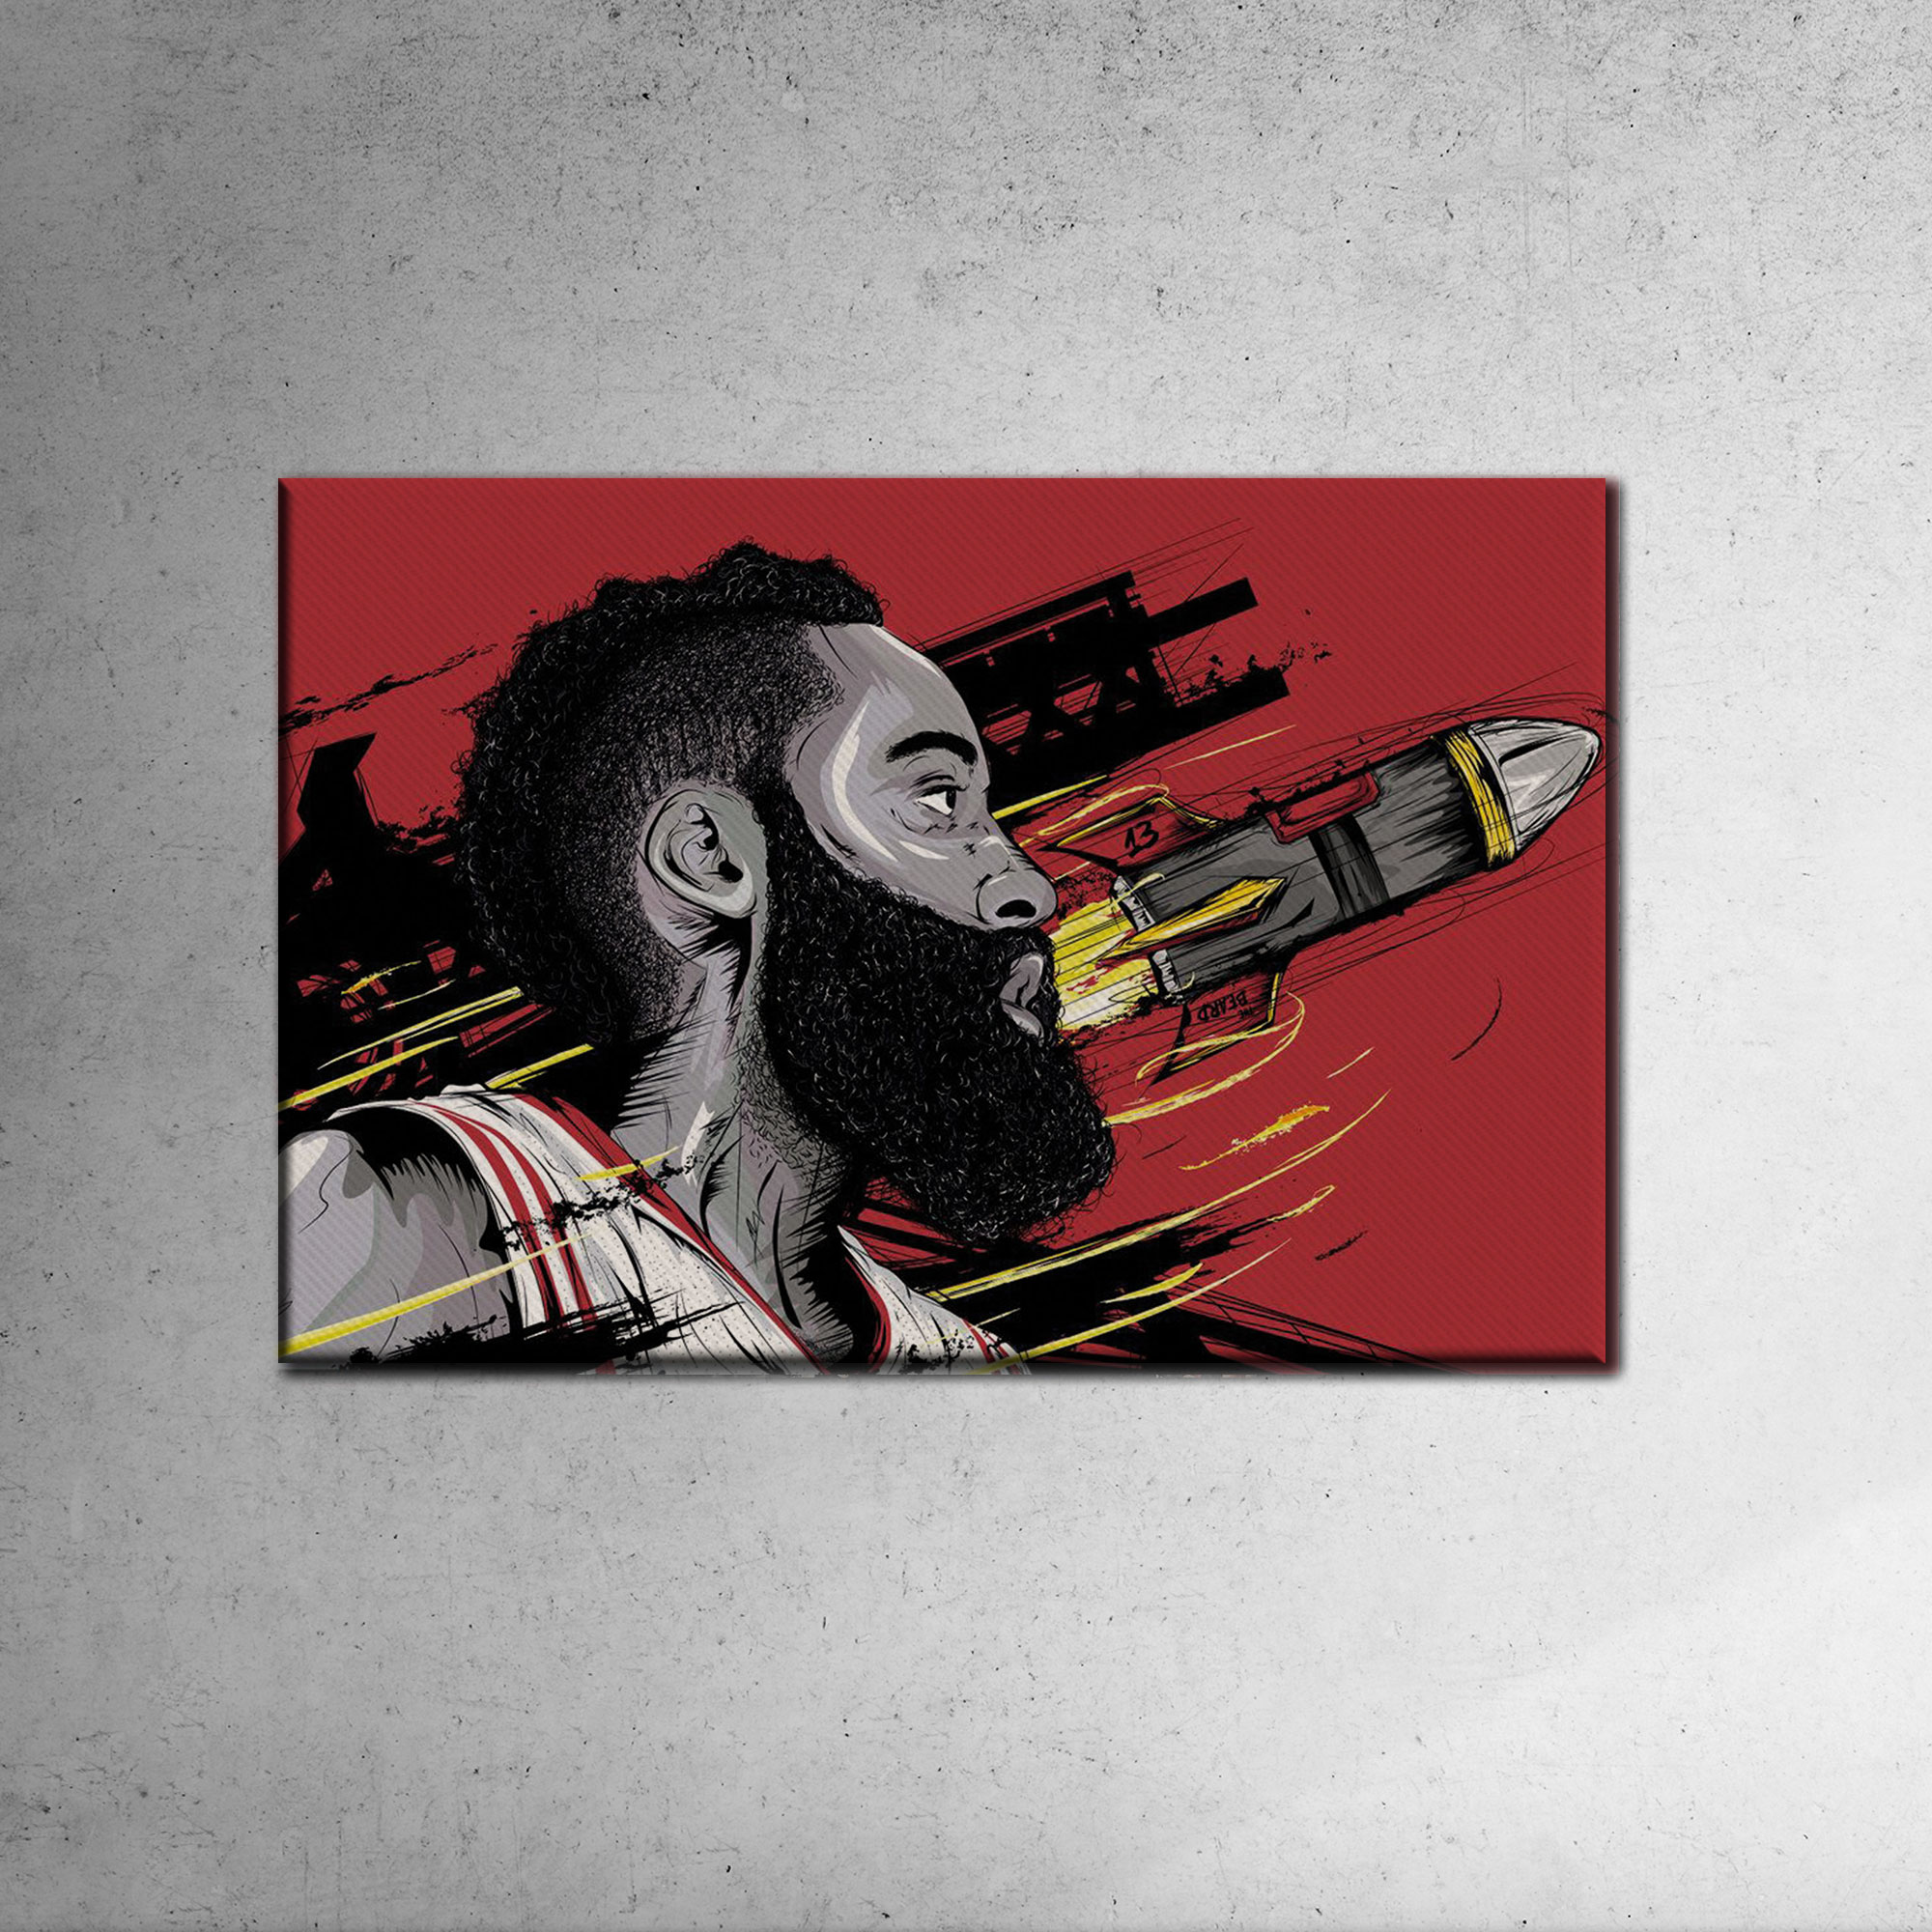 James Harden Canvas Tablo (Nba-canvas-harden2)